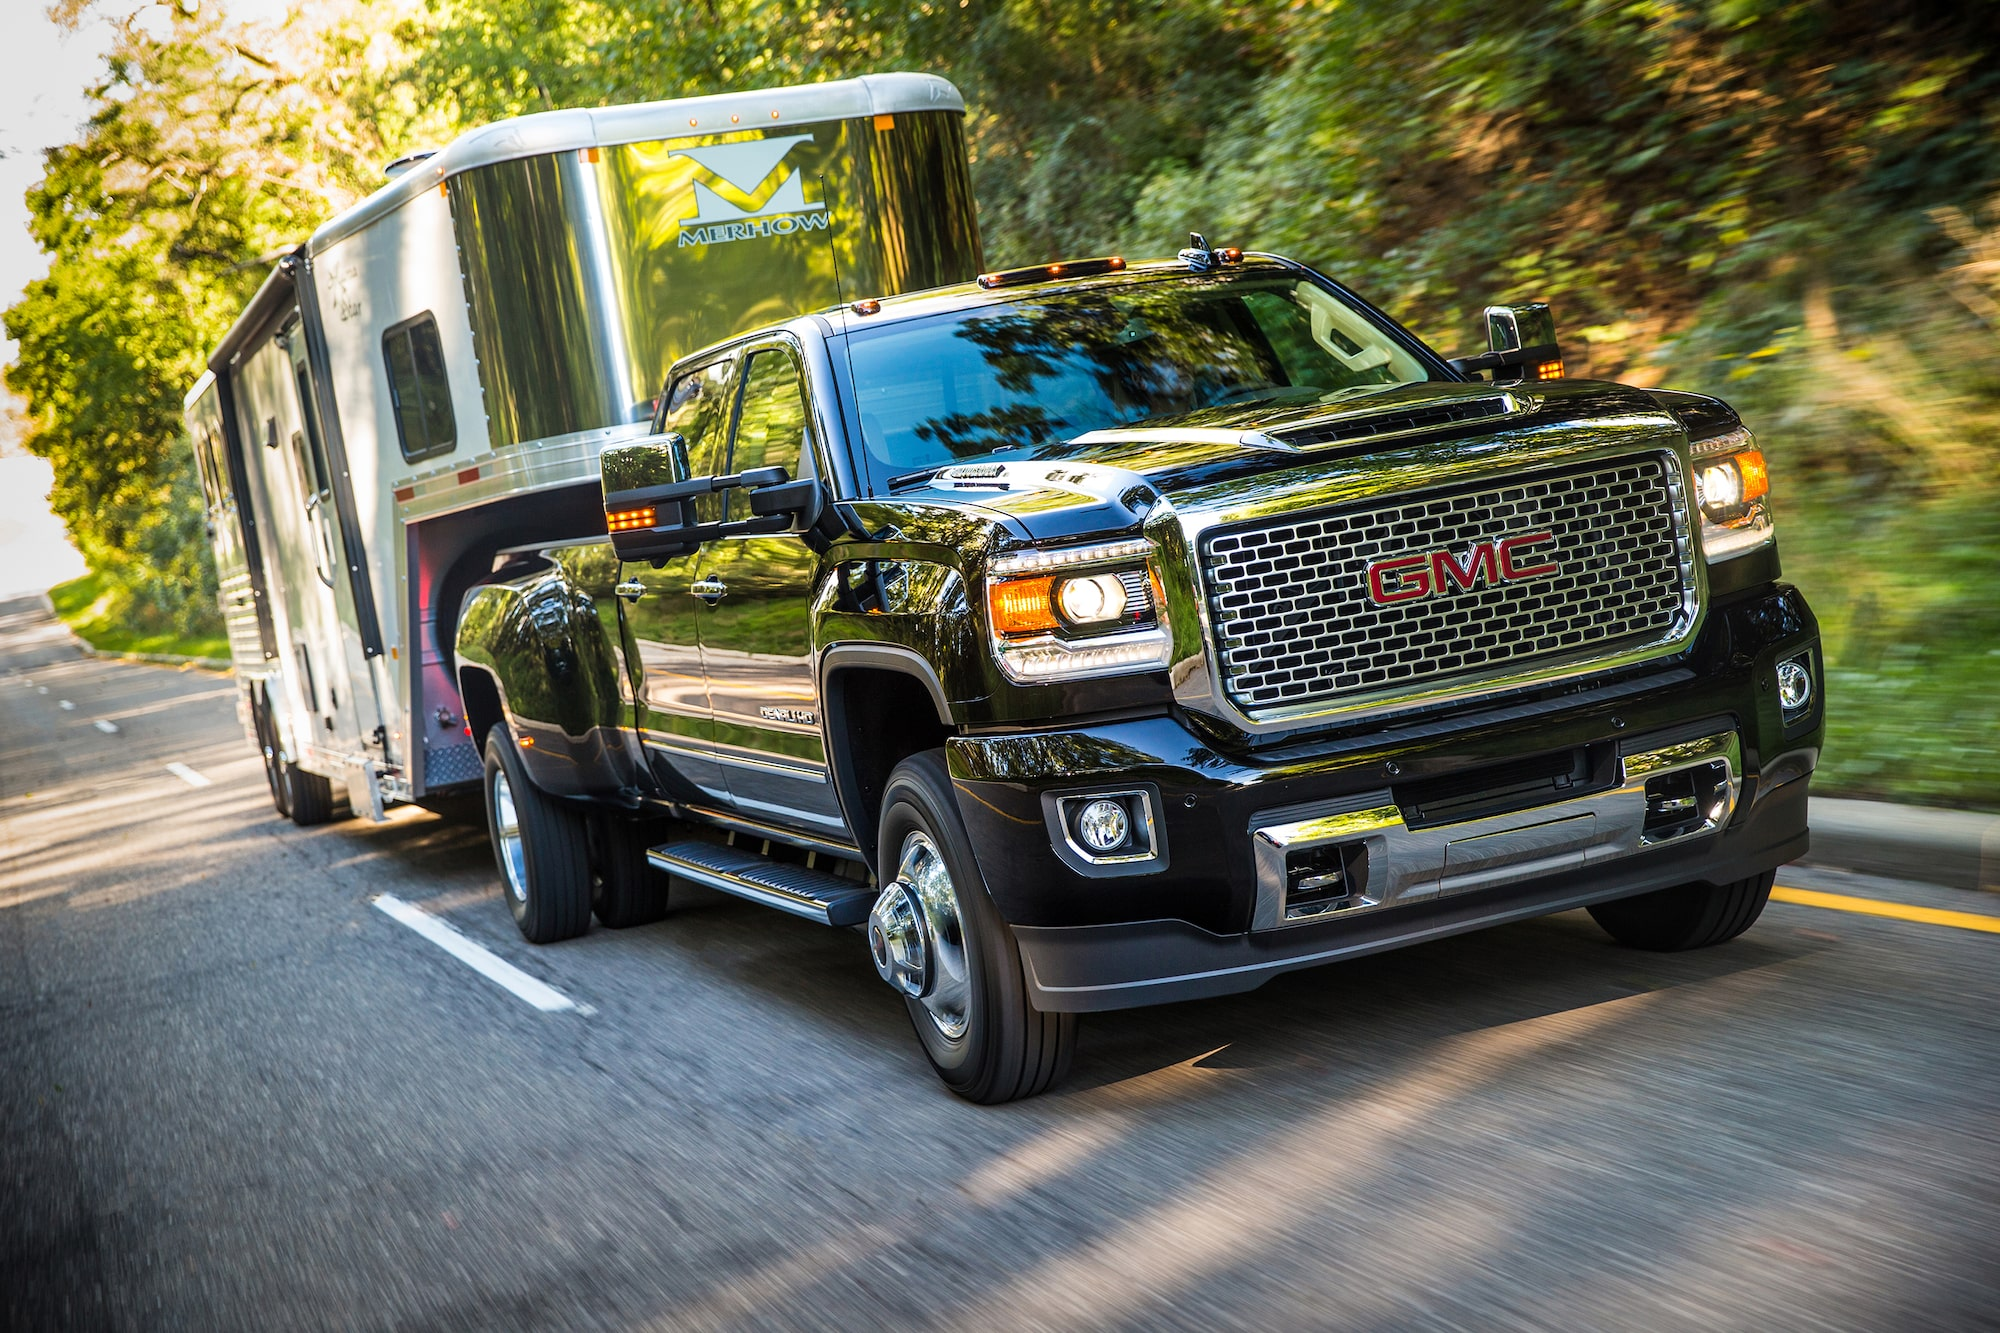 gmc life duramax diesel trailering  [ 1268 x 845 Pixel ]